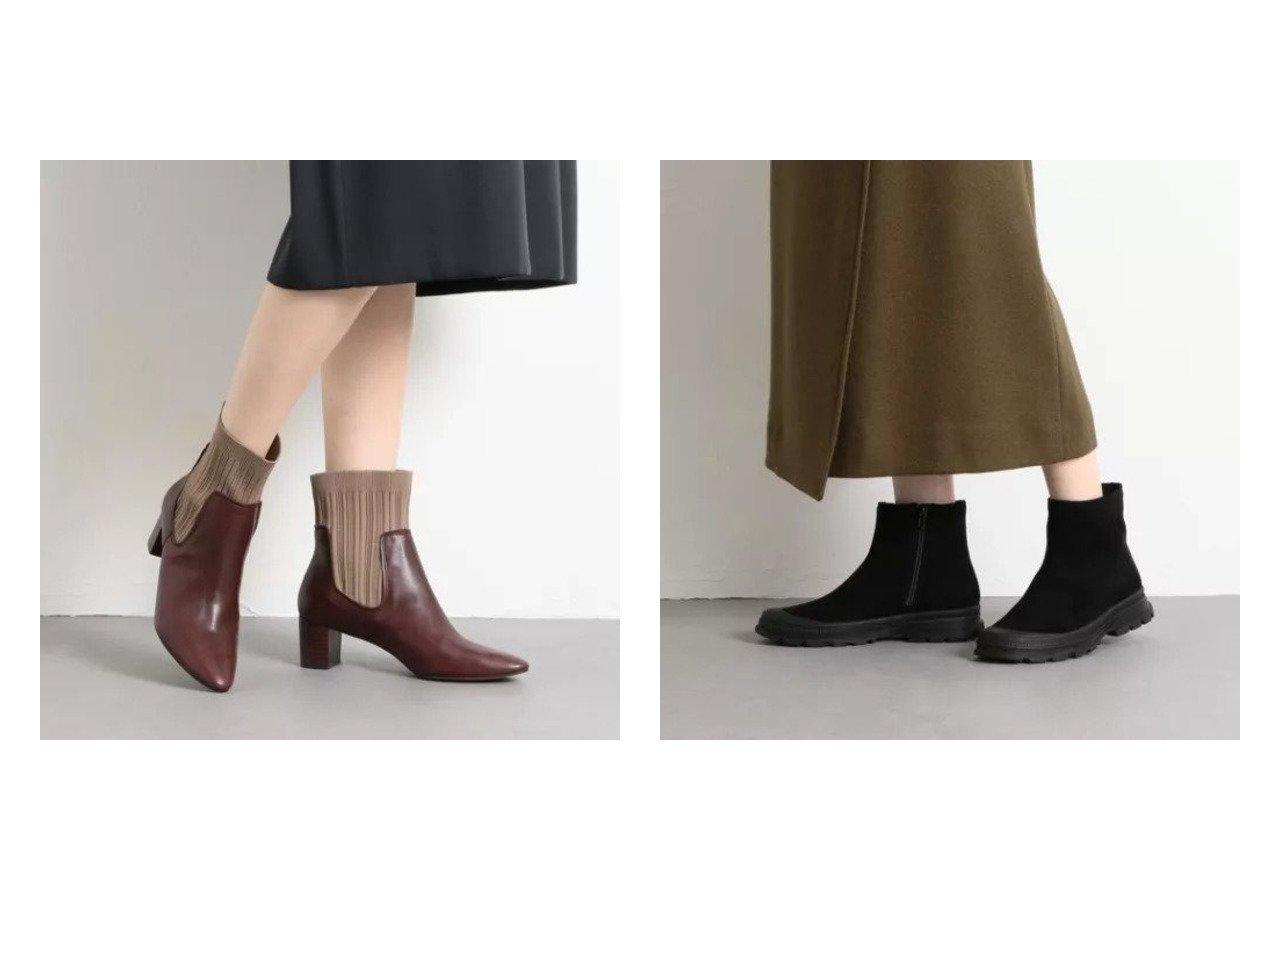 【Odette e Odile/オデット エ オディール】のOFC ニットコンビ ショートブーツ55&【WEB限定】O フェイクファー ショートブーツ30●↑ シューズ・靴のおすすめ!人気、レディースファッションの通販  おすすめで人気のファッション通販商品 インテリア・家具・キッズファッション・メンズファッション・レディースファッション・服の通販 founy(ファニー) https://founy.com/ ファッション Fashion レディース WOMEN コンビ シューズ ショート リブニット フェイクファー |ID:crp329100000004124